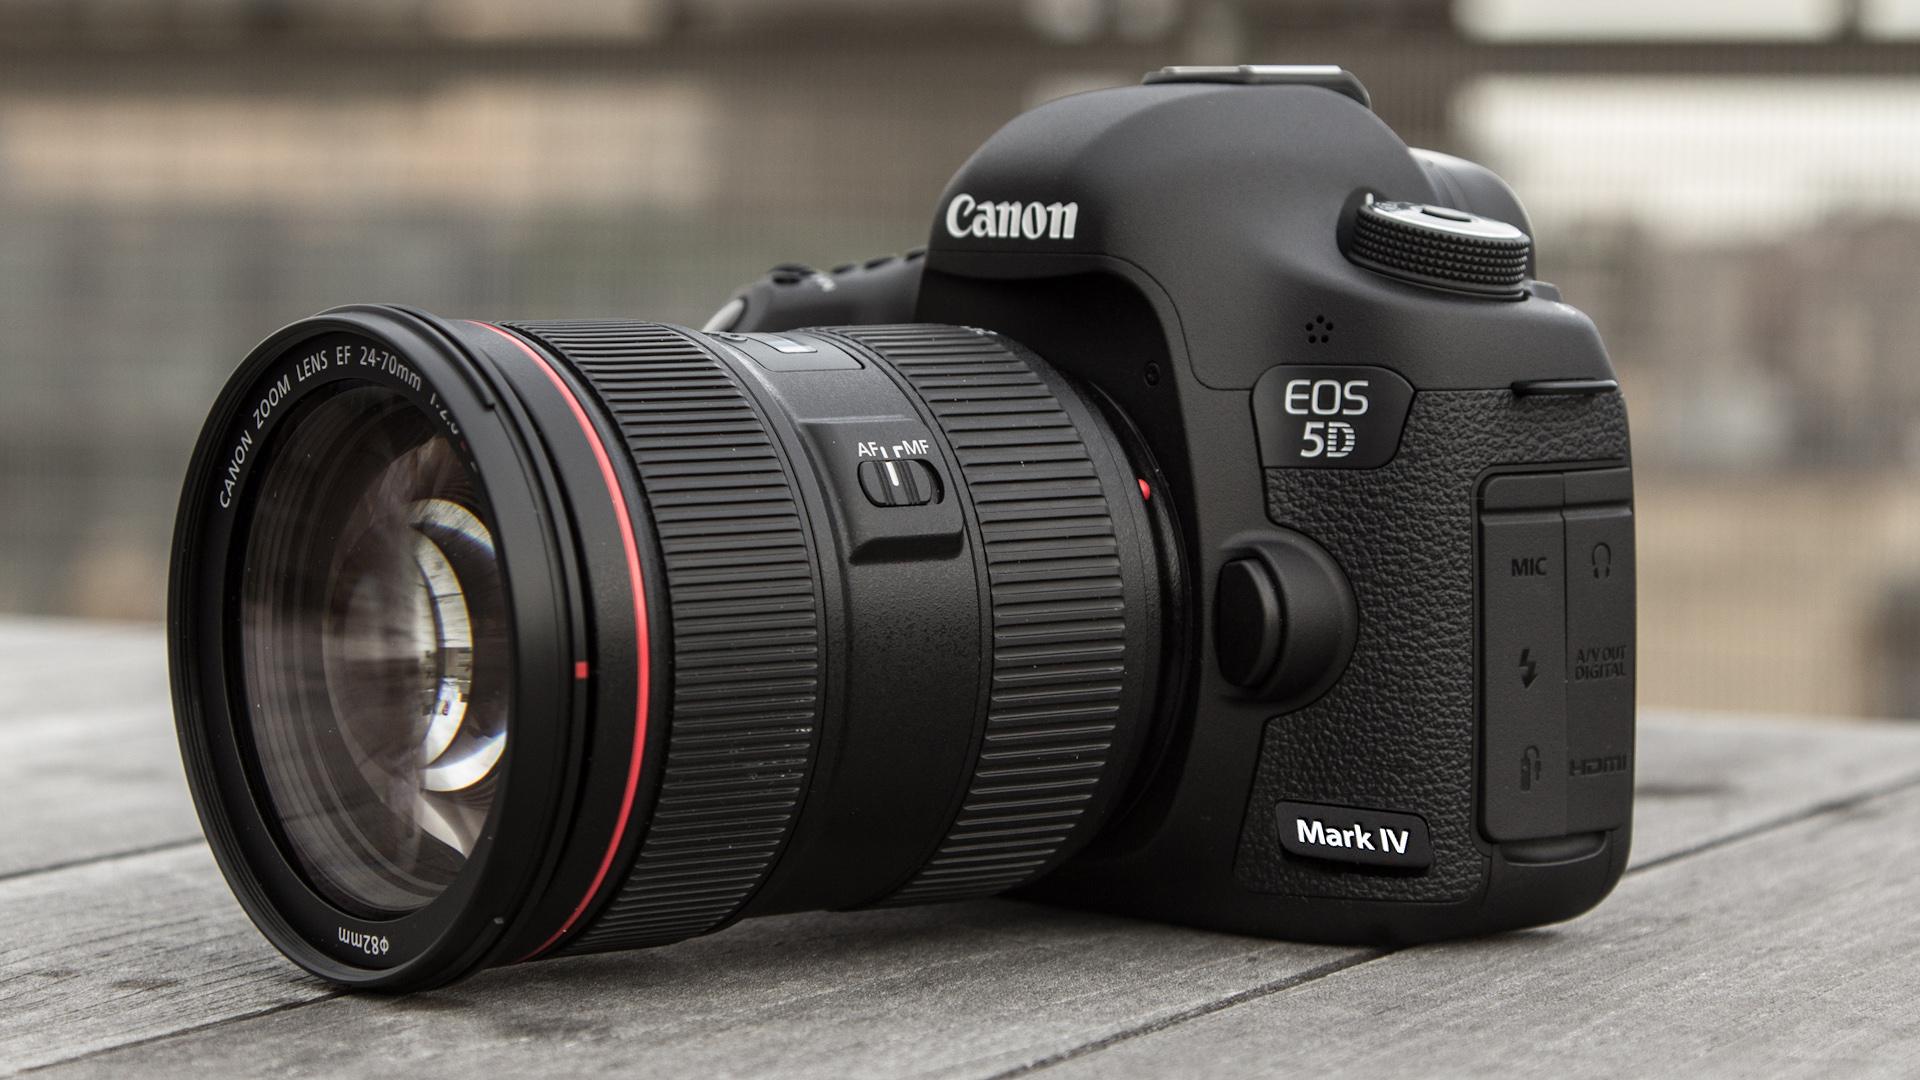 Kamera Canon Menurut Tanggal Rilis Artikel Mk Photography Eos 1200d Lensa 18 55mm Kit 5d Mark Iv